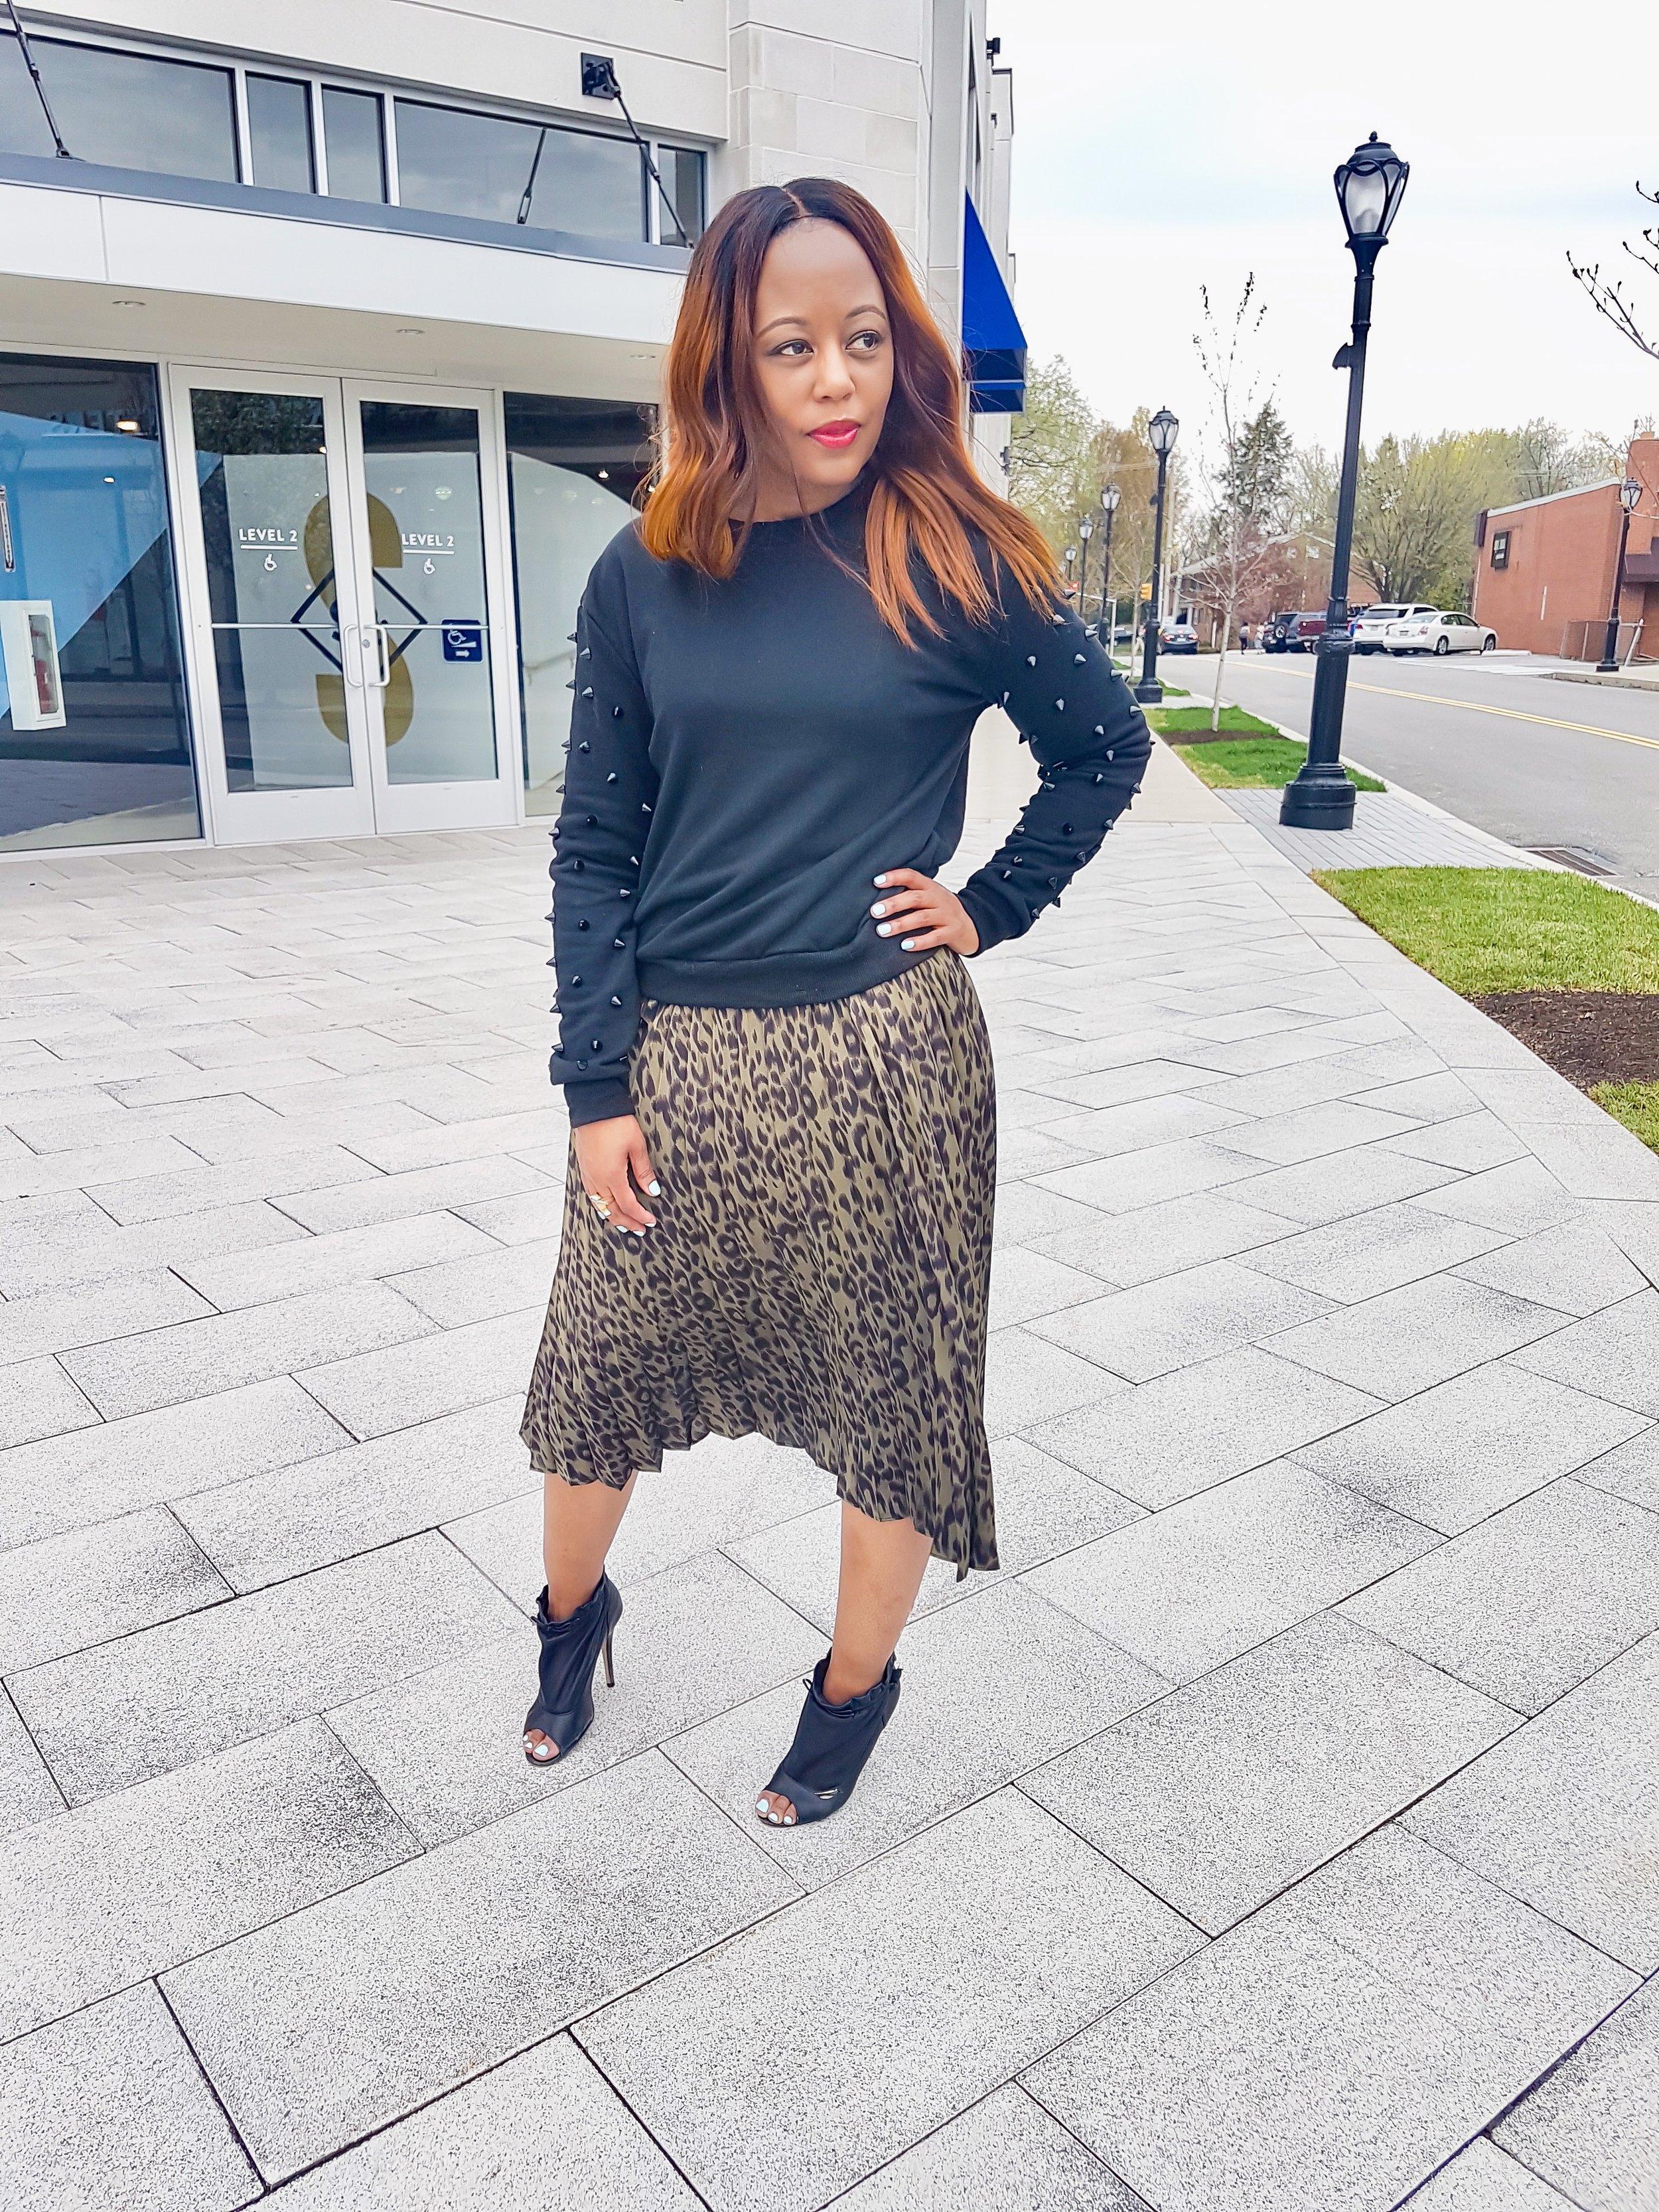 Skirt ( Pynk Mannequin)   T-shirt, Tube Top, Sweatshirt (old)